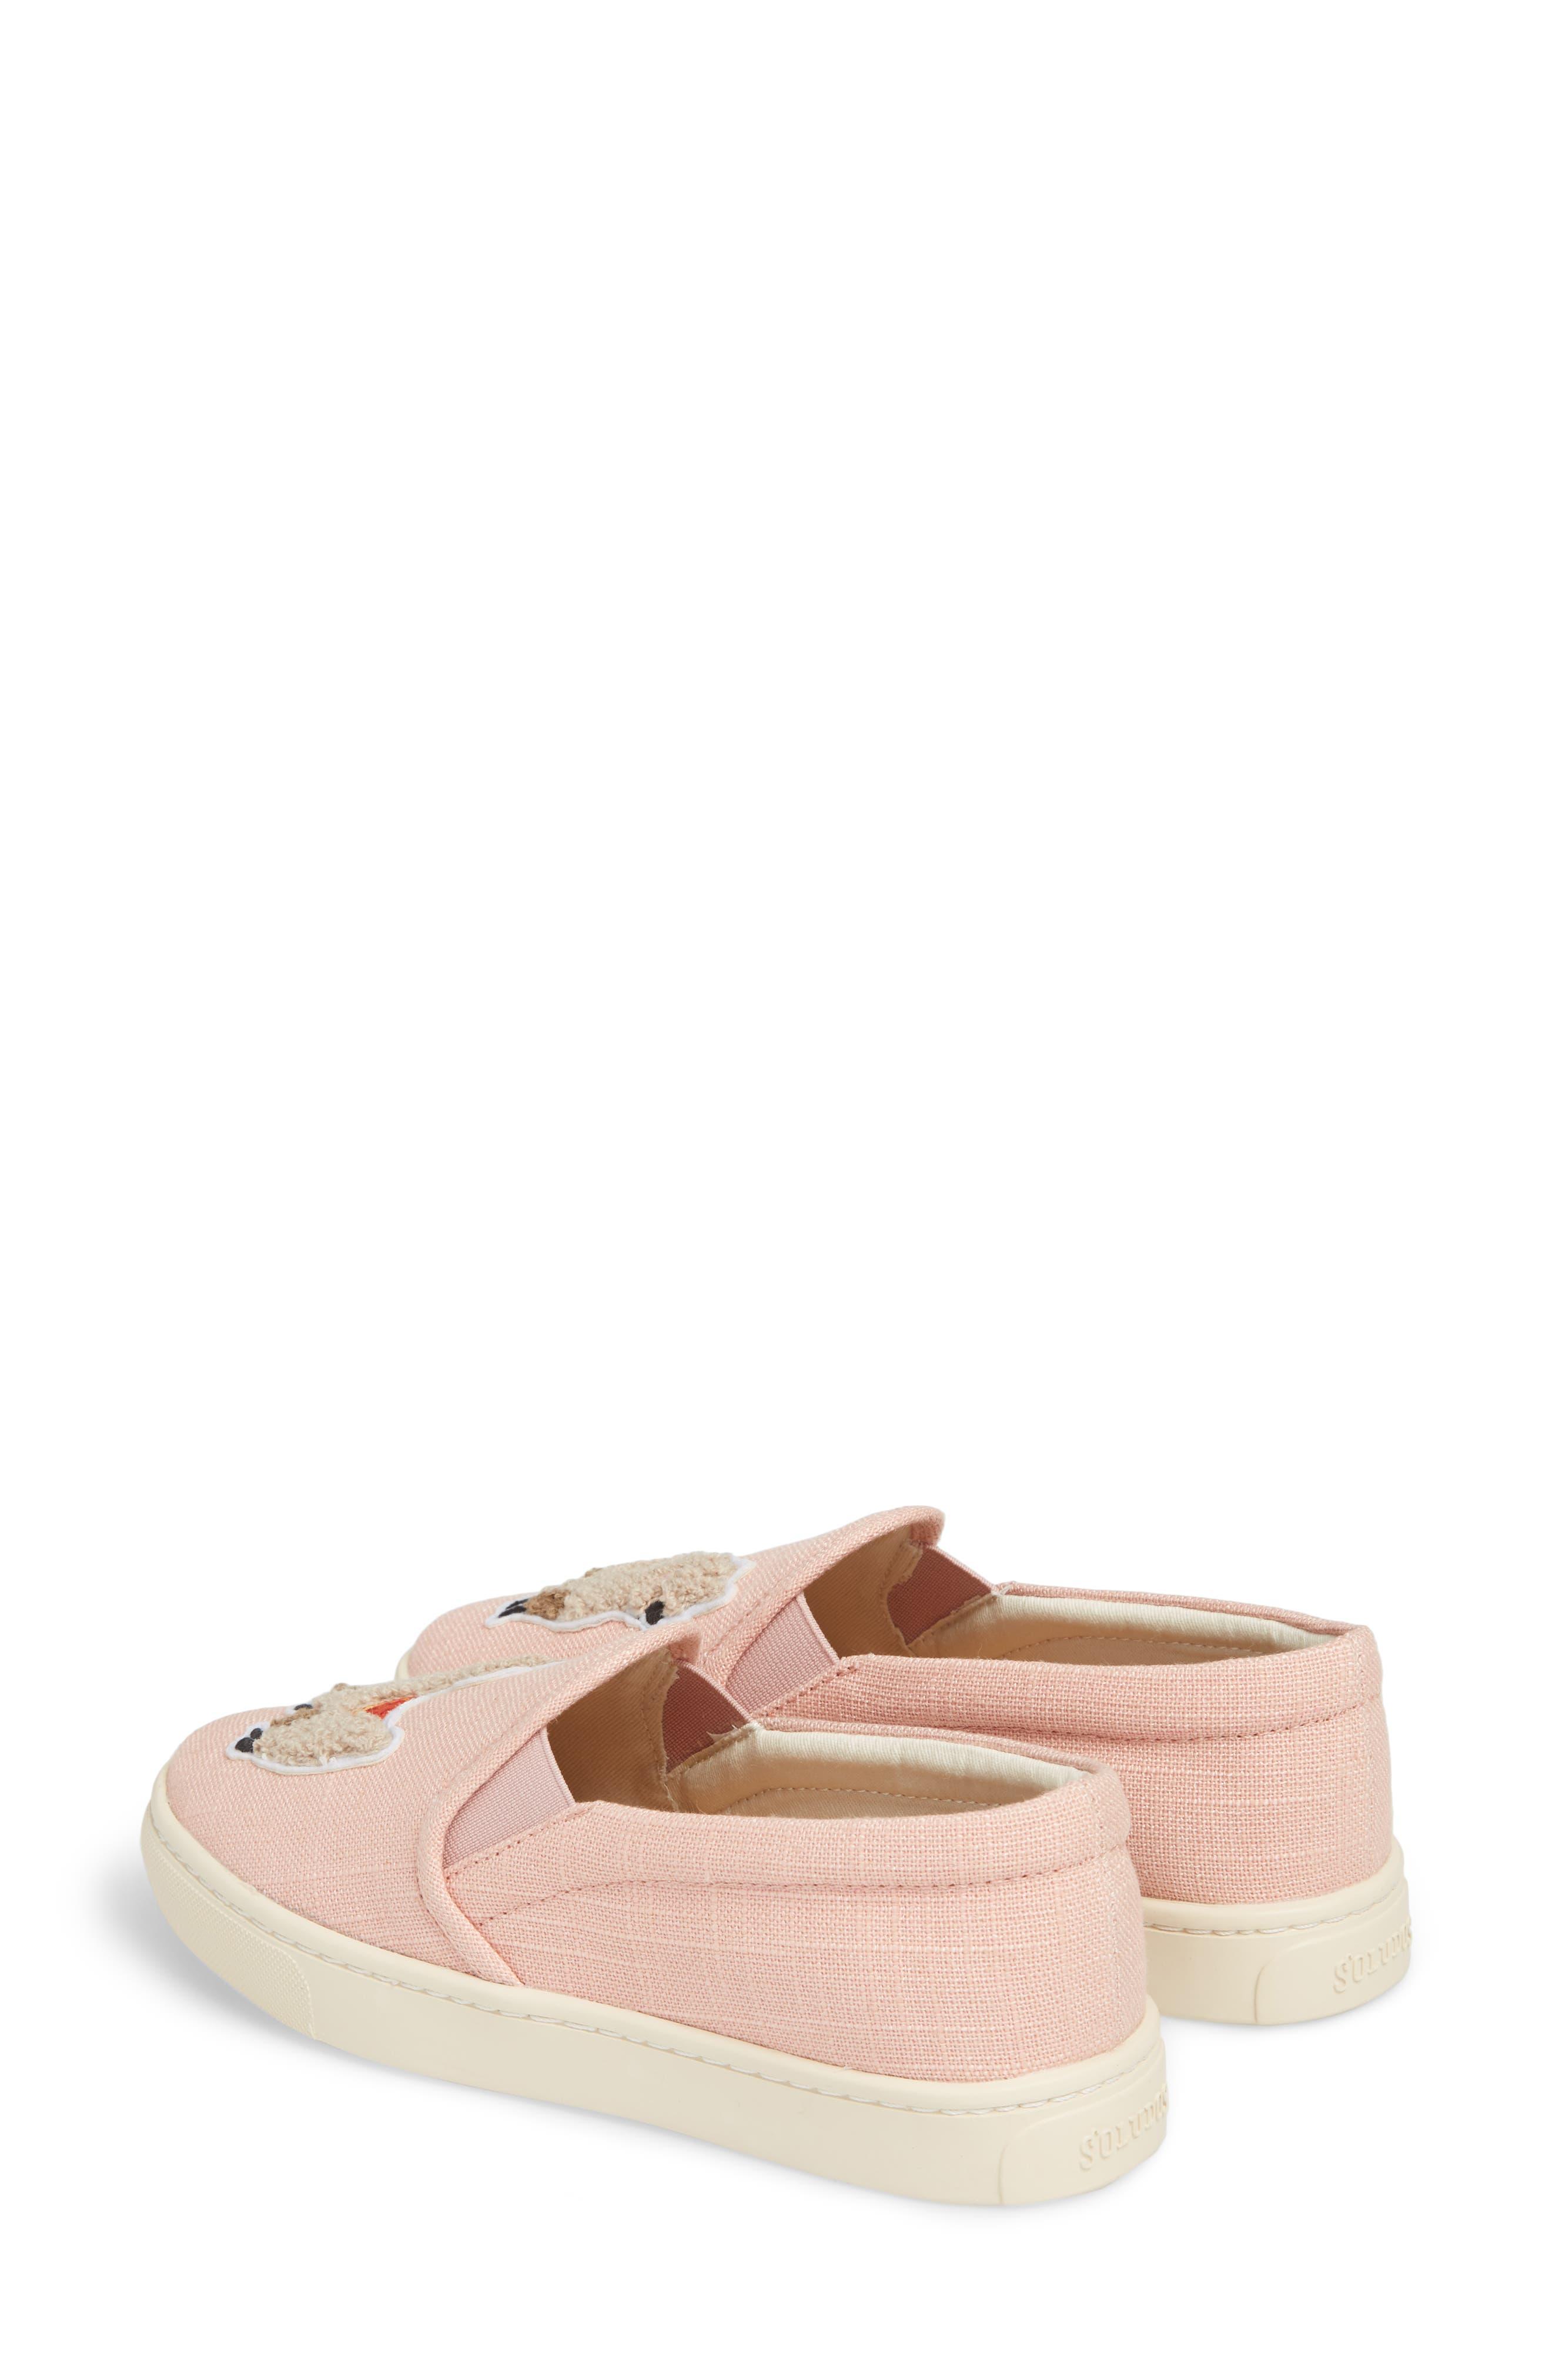 Llama Slip-On Sneaker,                             Alternate thumbnail 3, color,                             Dusty Rose Fabric